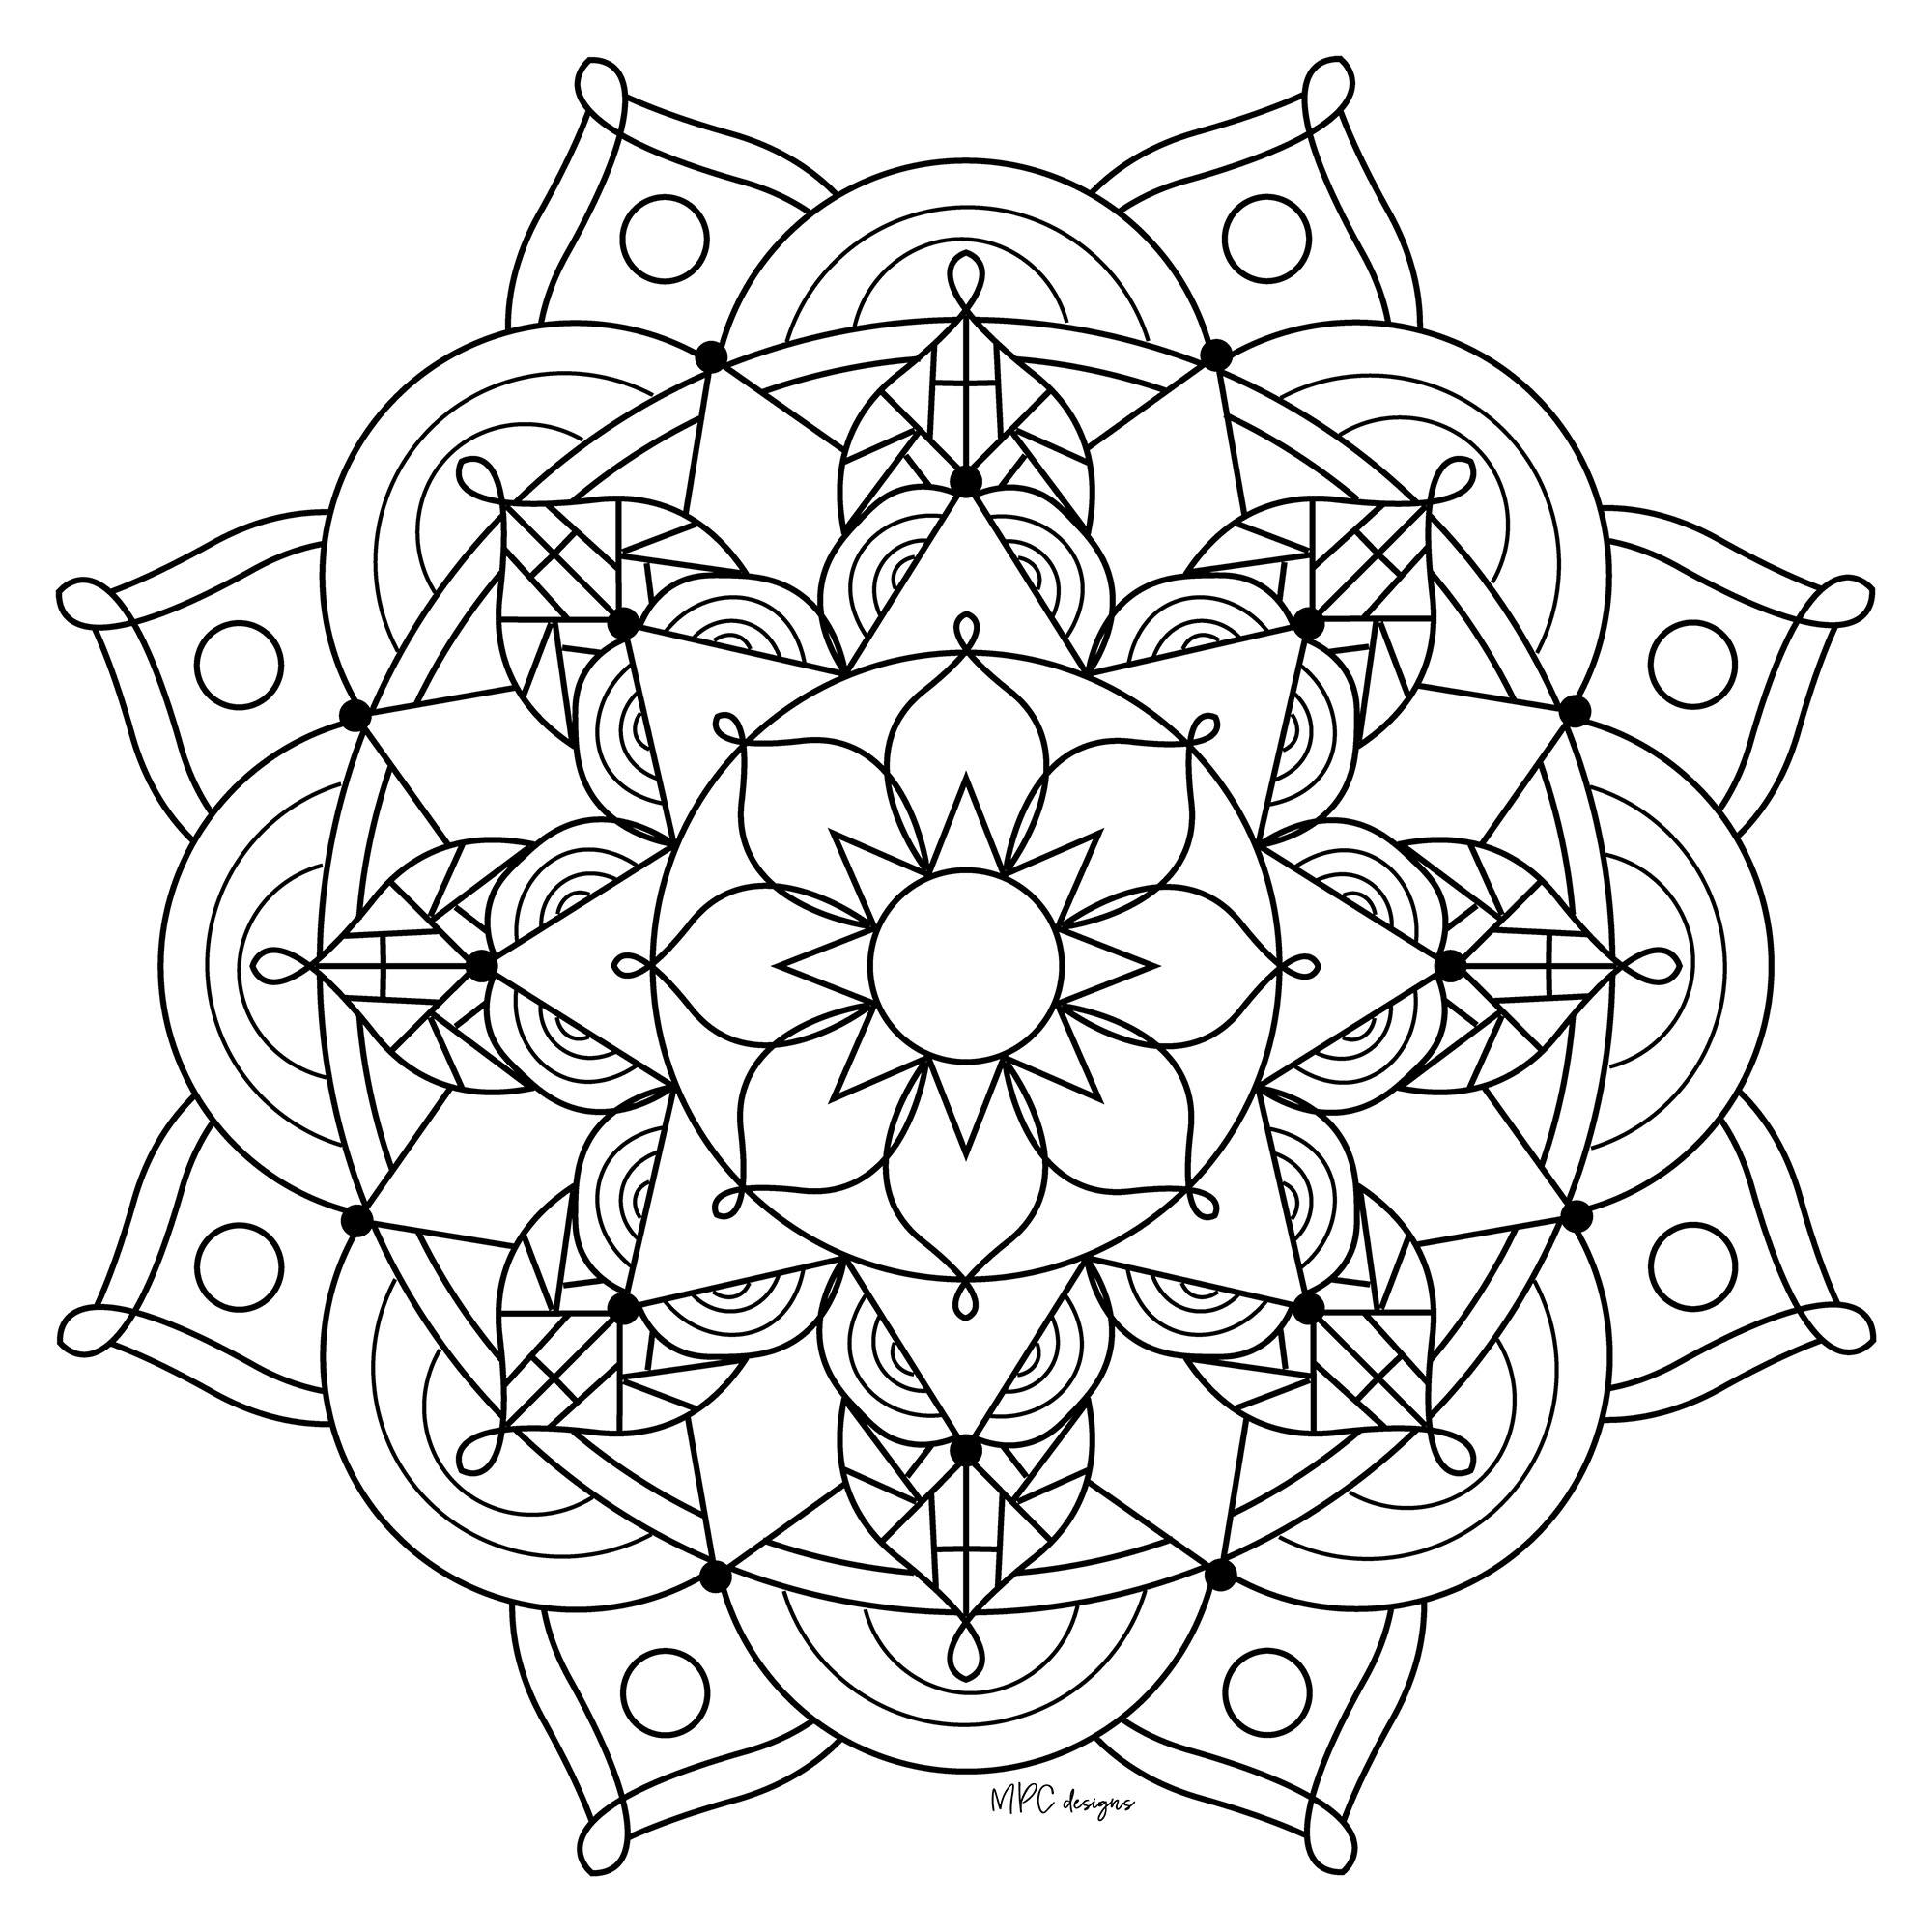 Mandalas to color for kids - Mandalas Kids Coloring Pages